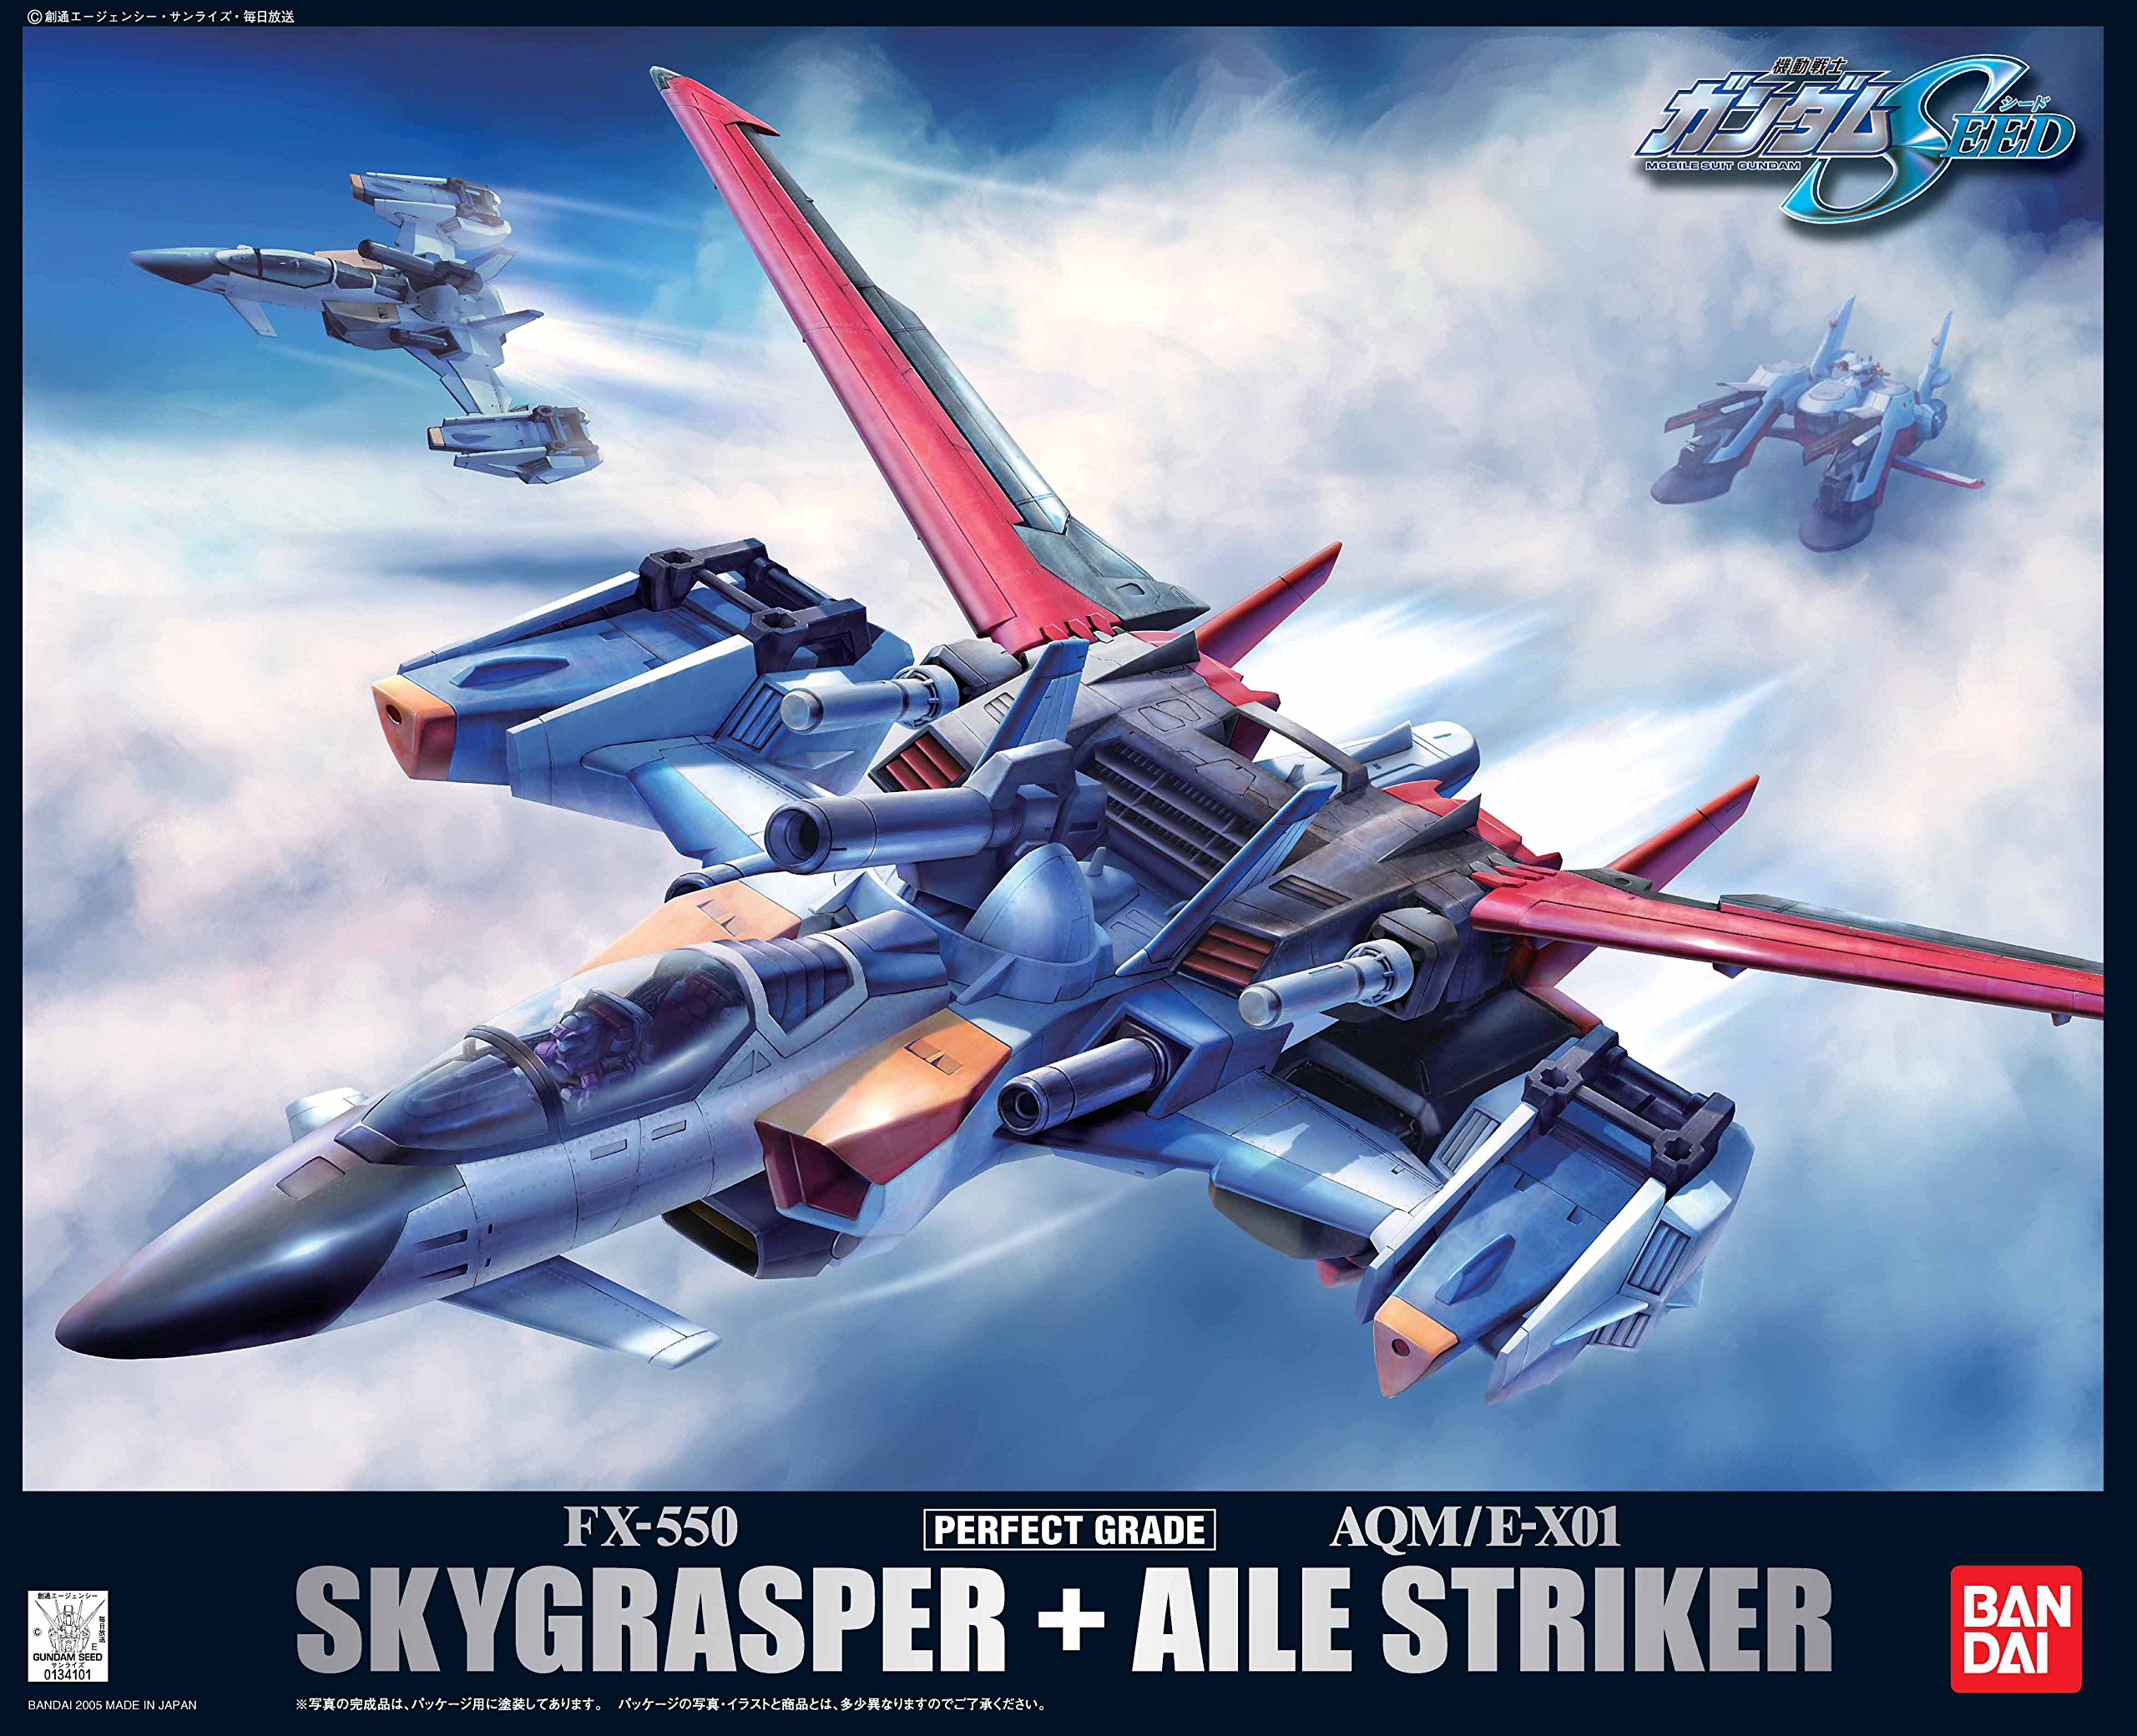 PG AQM/E-X01+FX-550 翔翼型攻击装备+空中霸王(1:60)